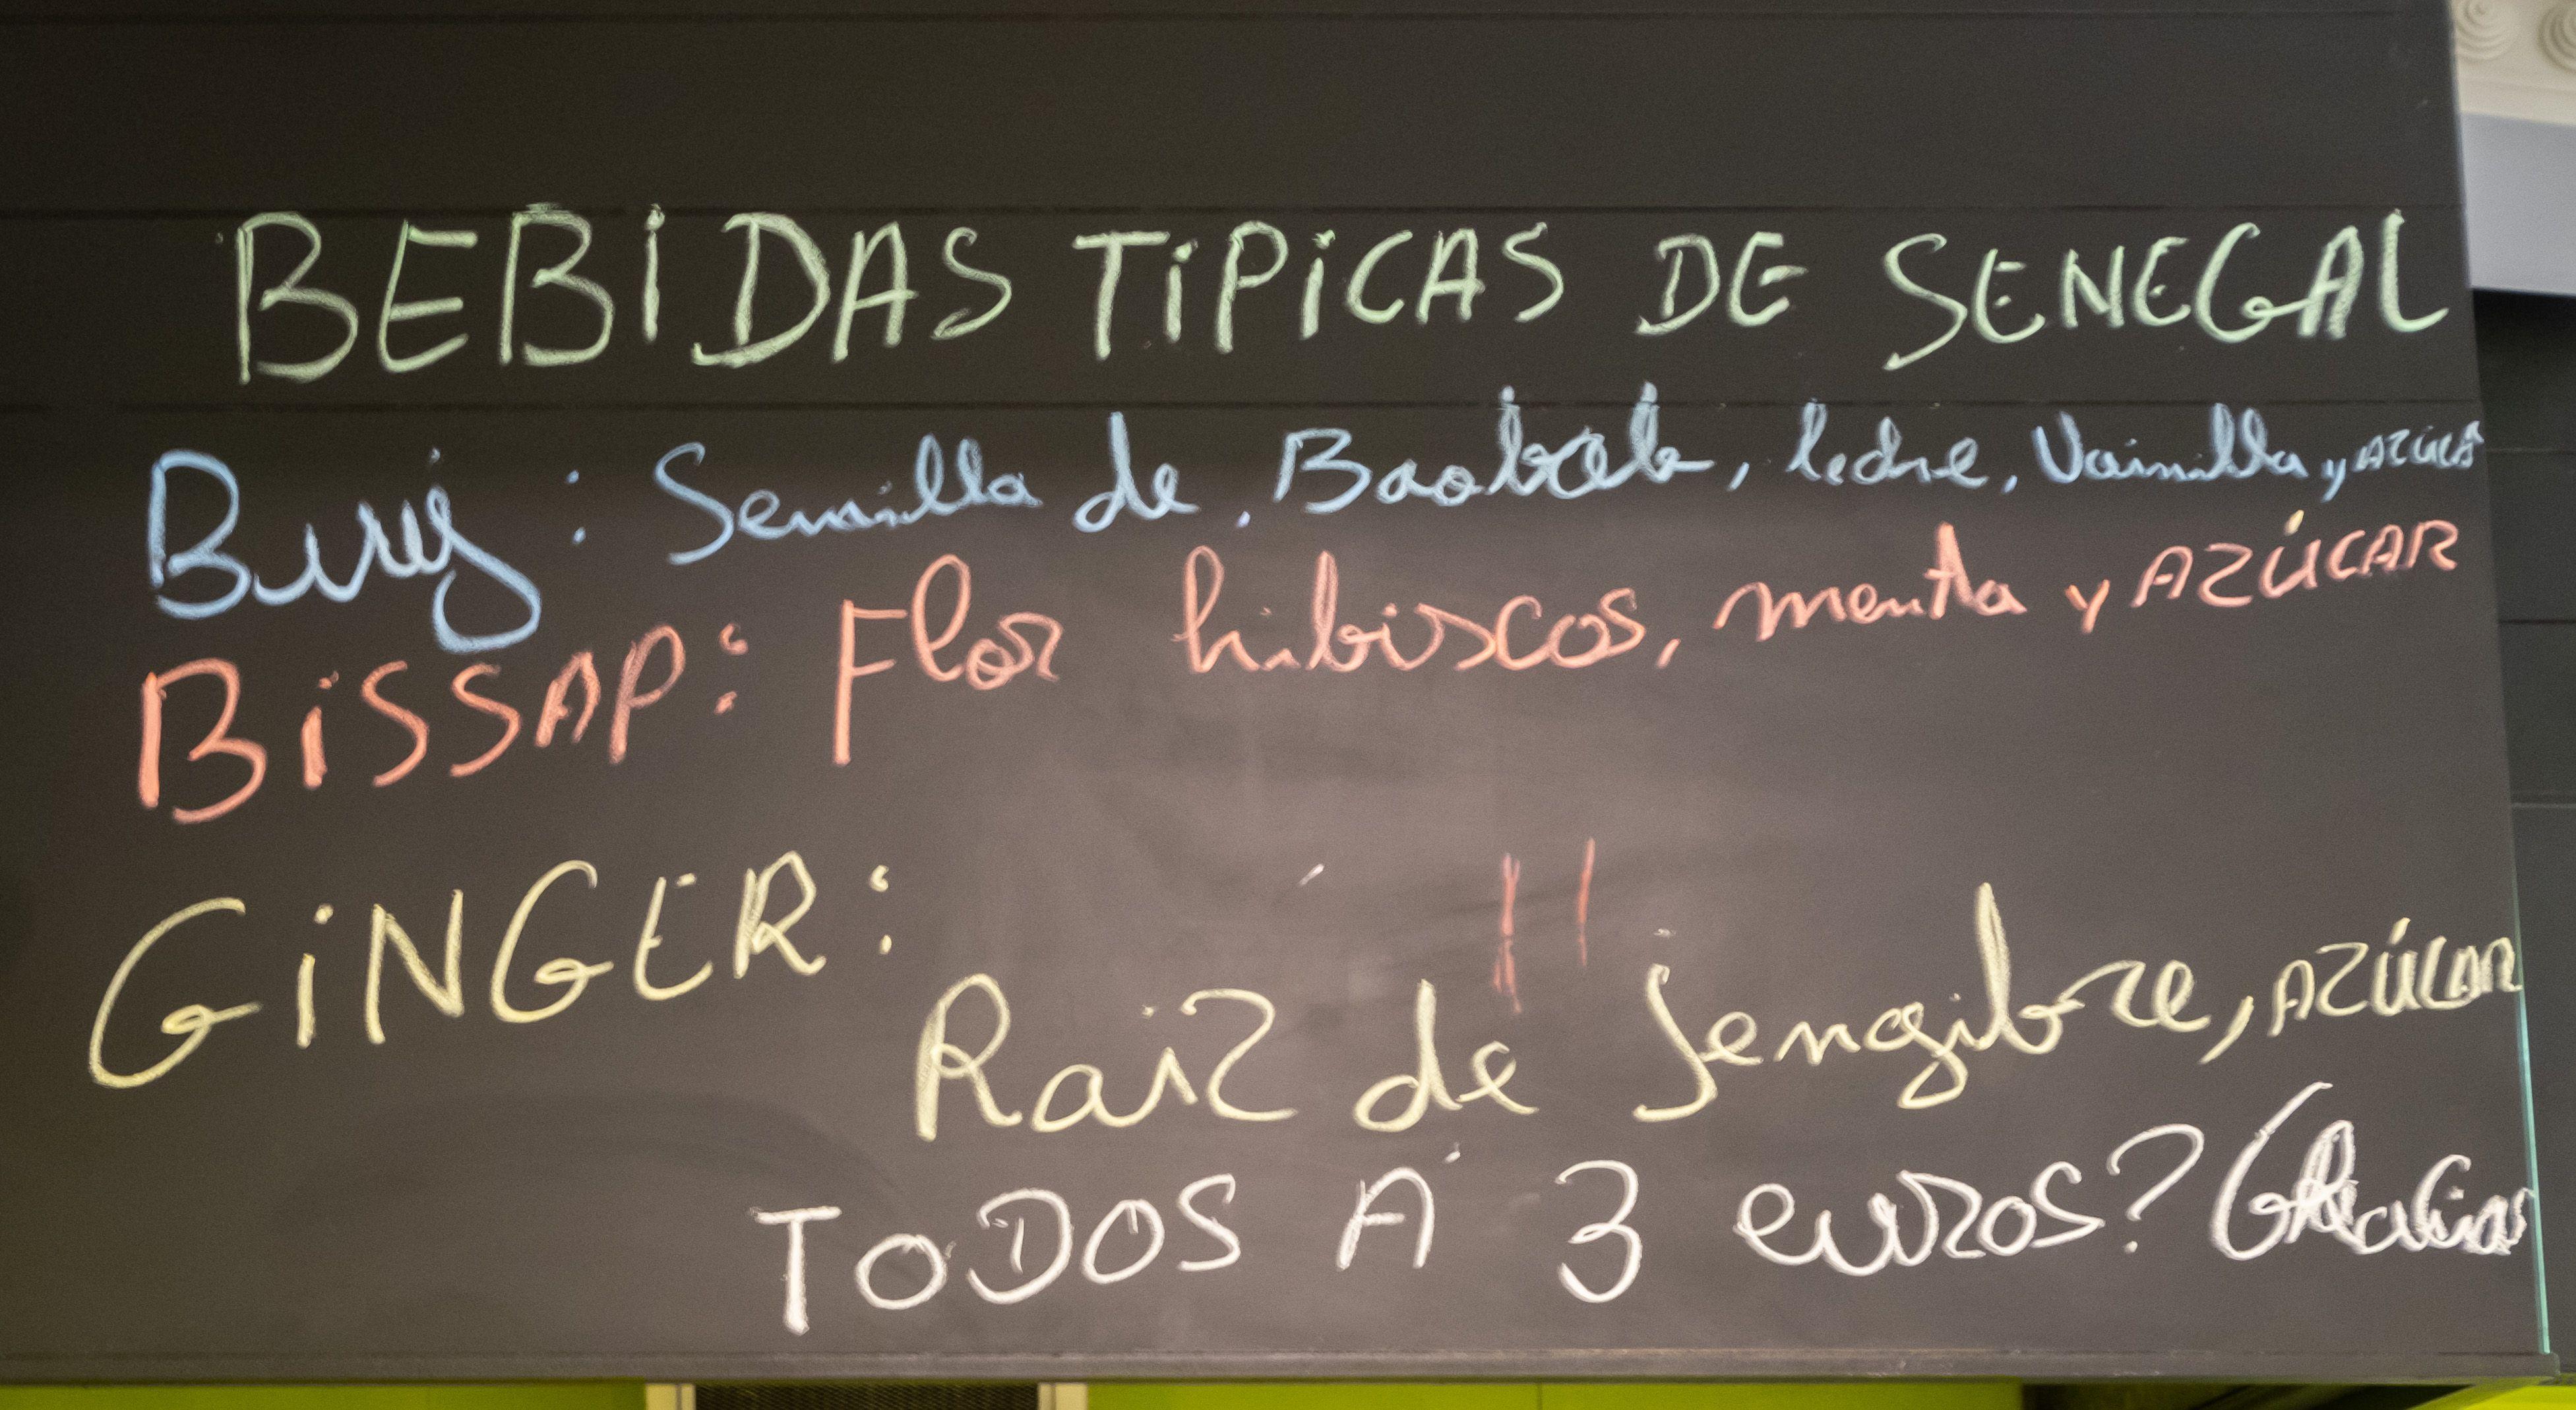 Comida senegalesa eixample en Barcelona